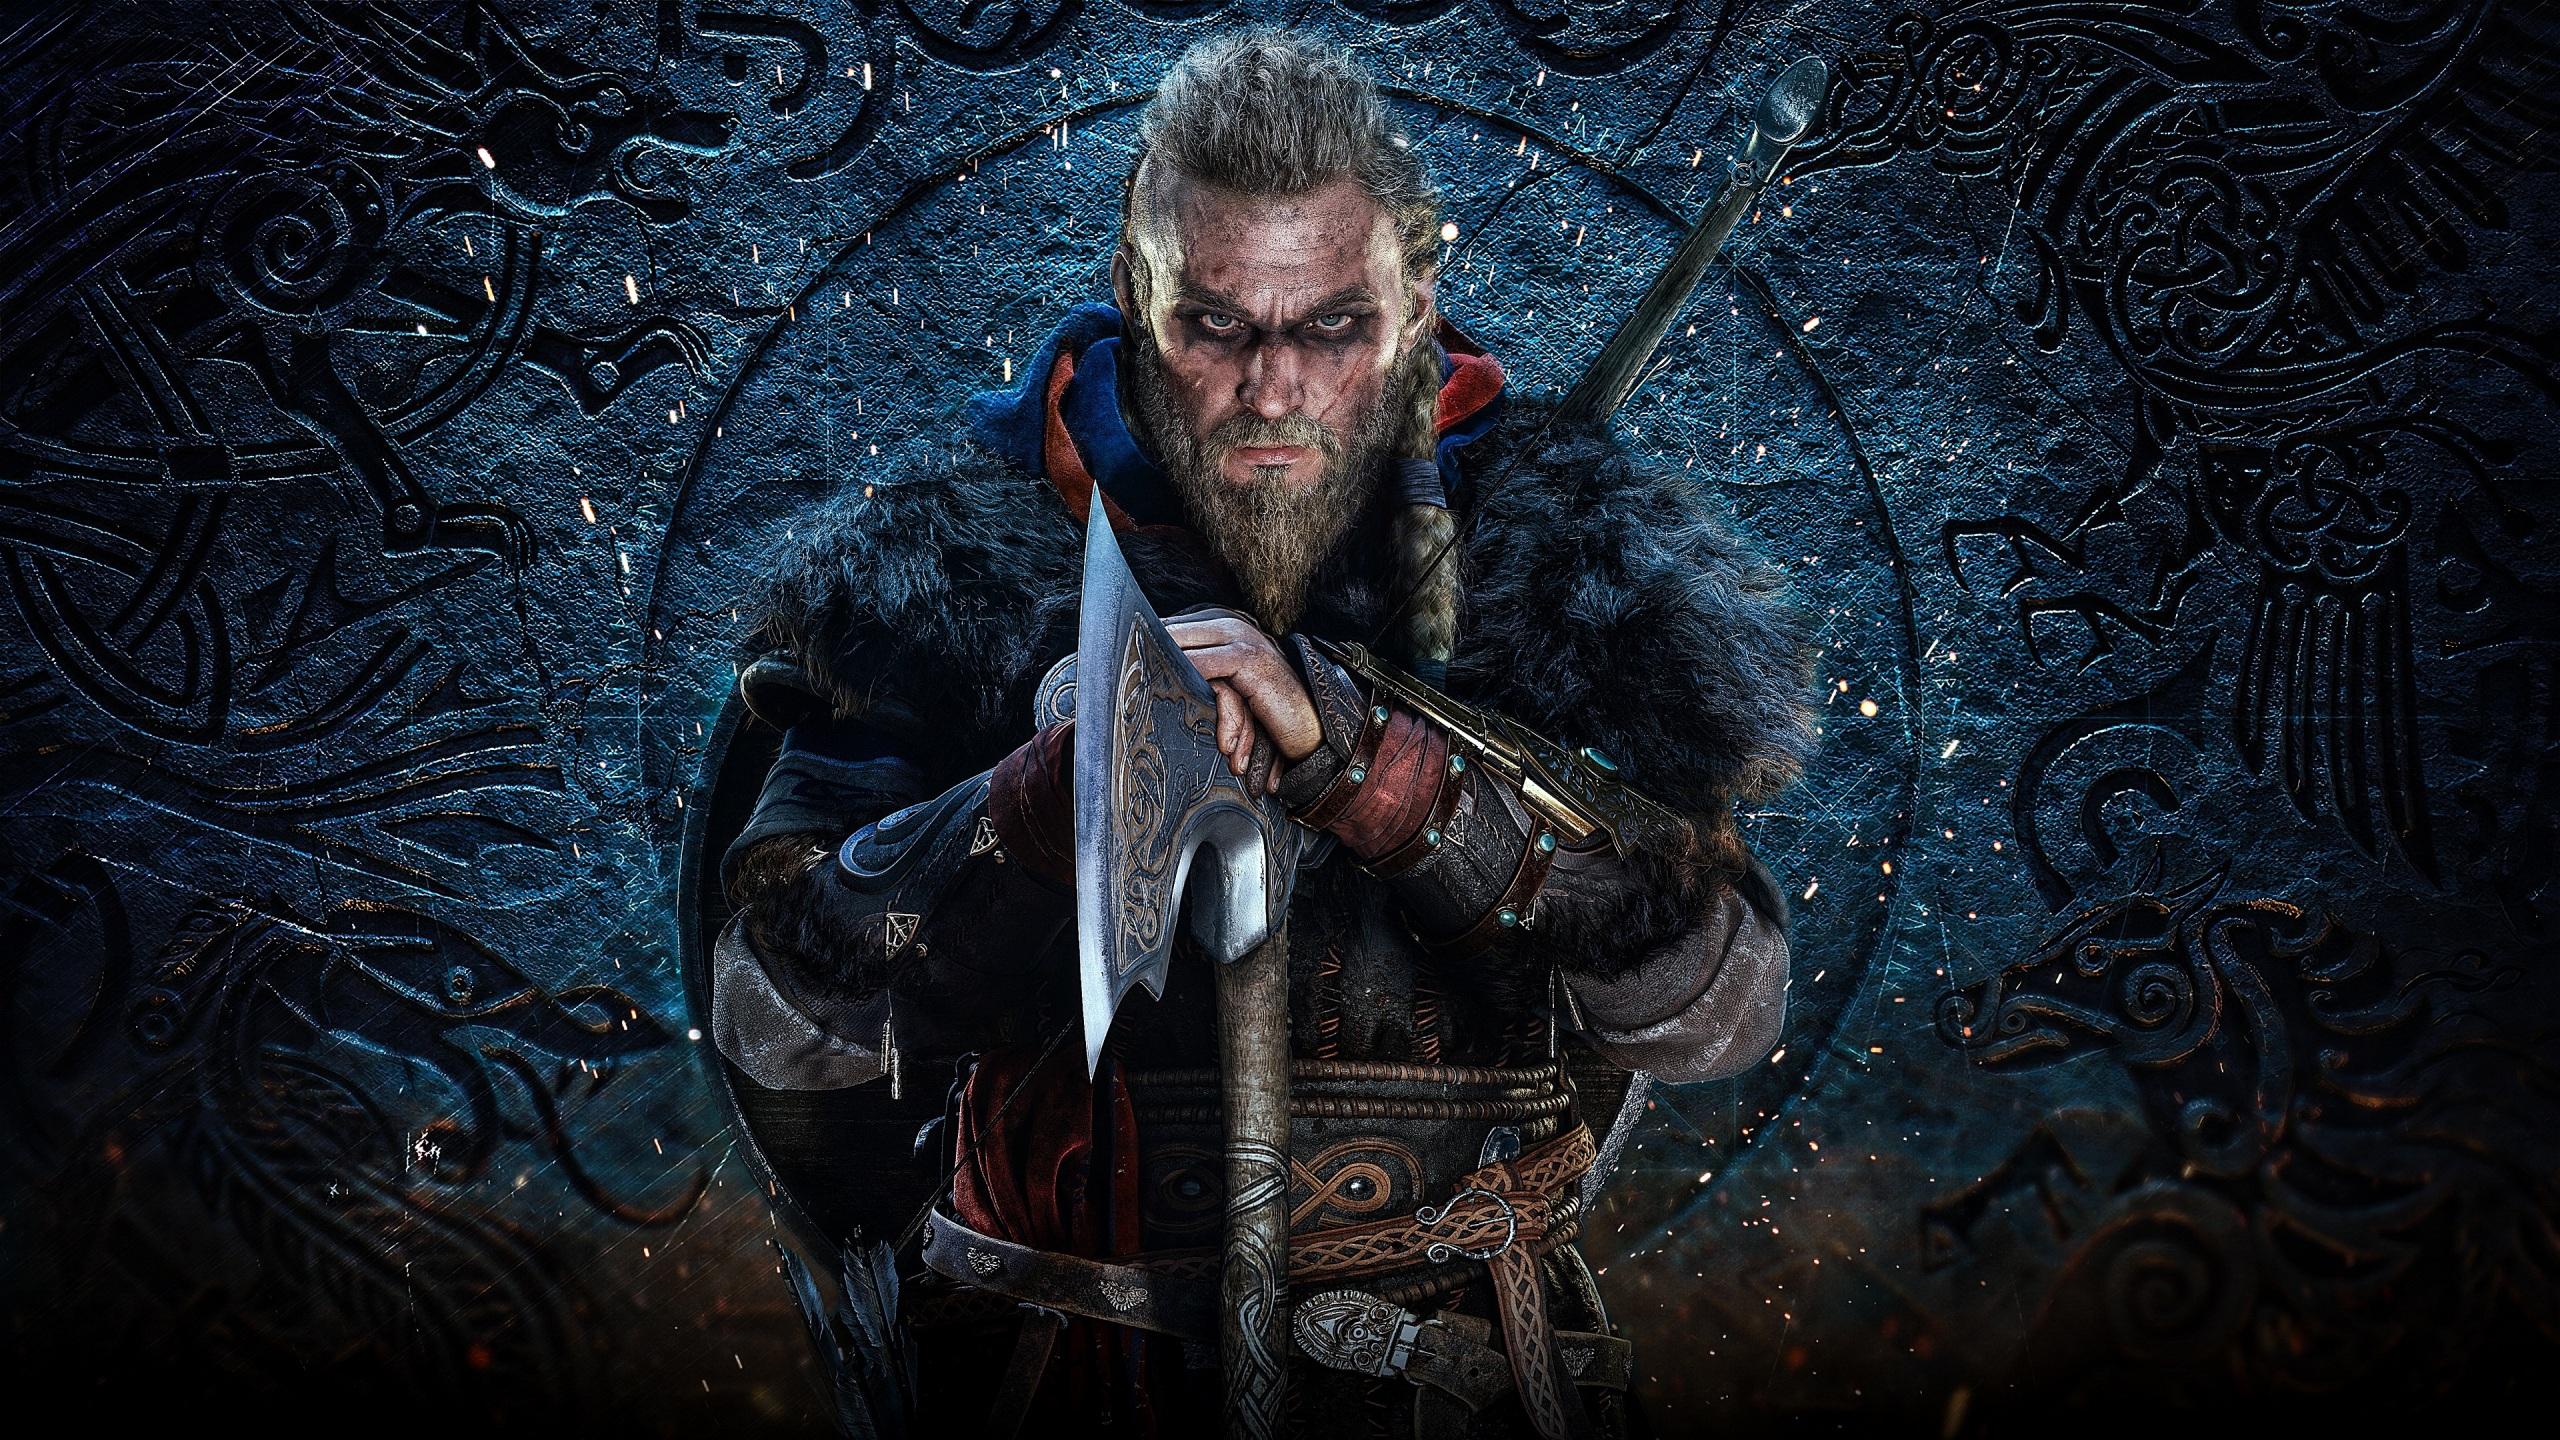 Desktop Wallpapers Assassin S Creed Vikings Battle Axes 2560x1440